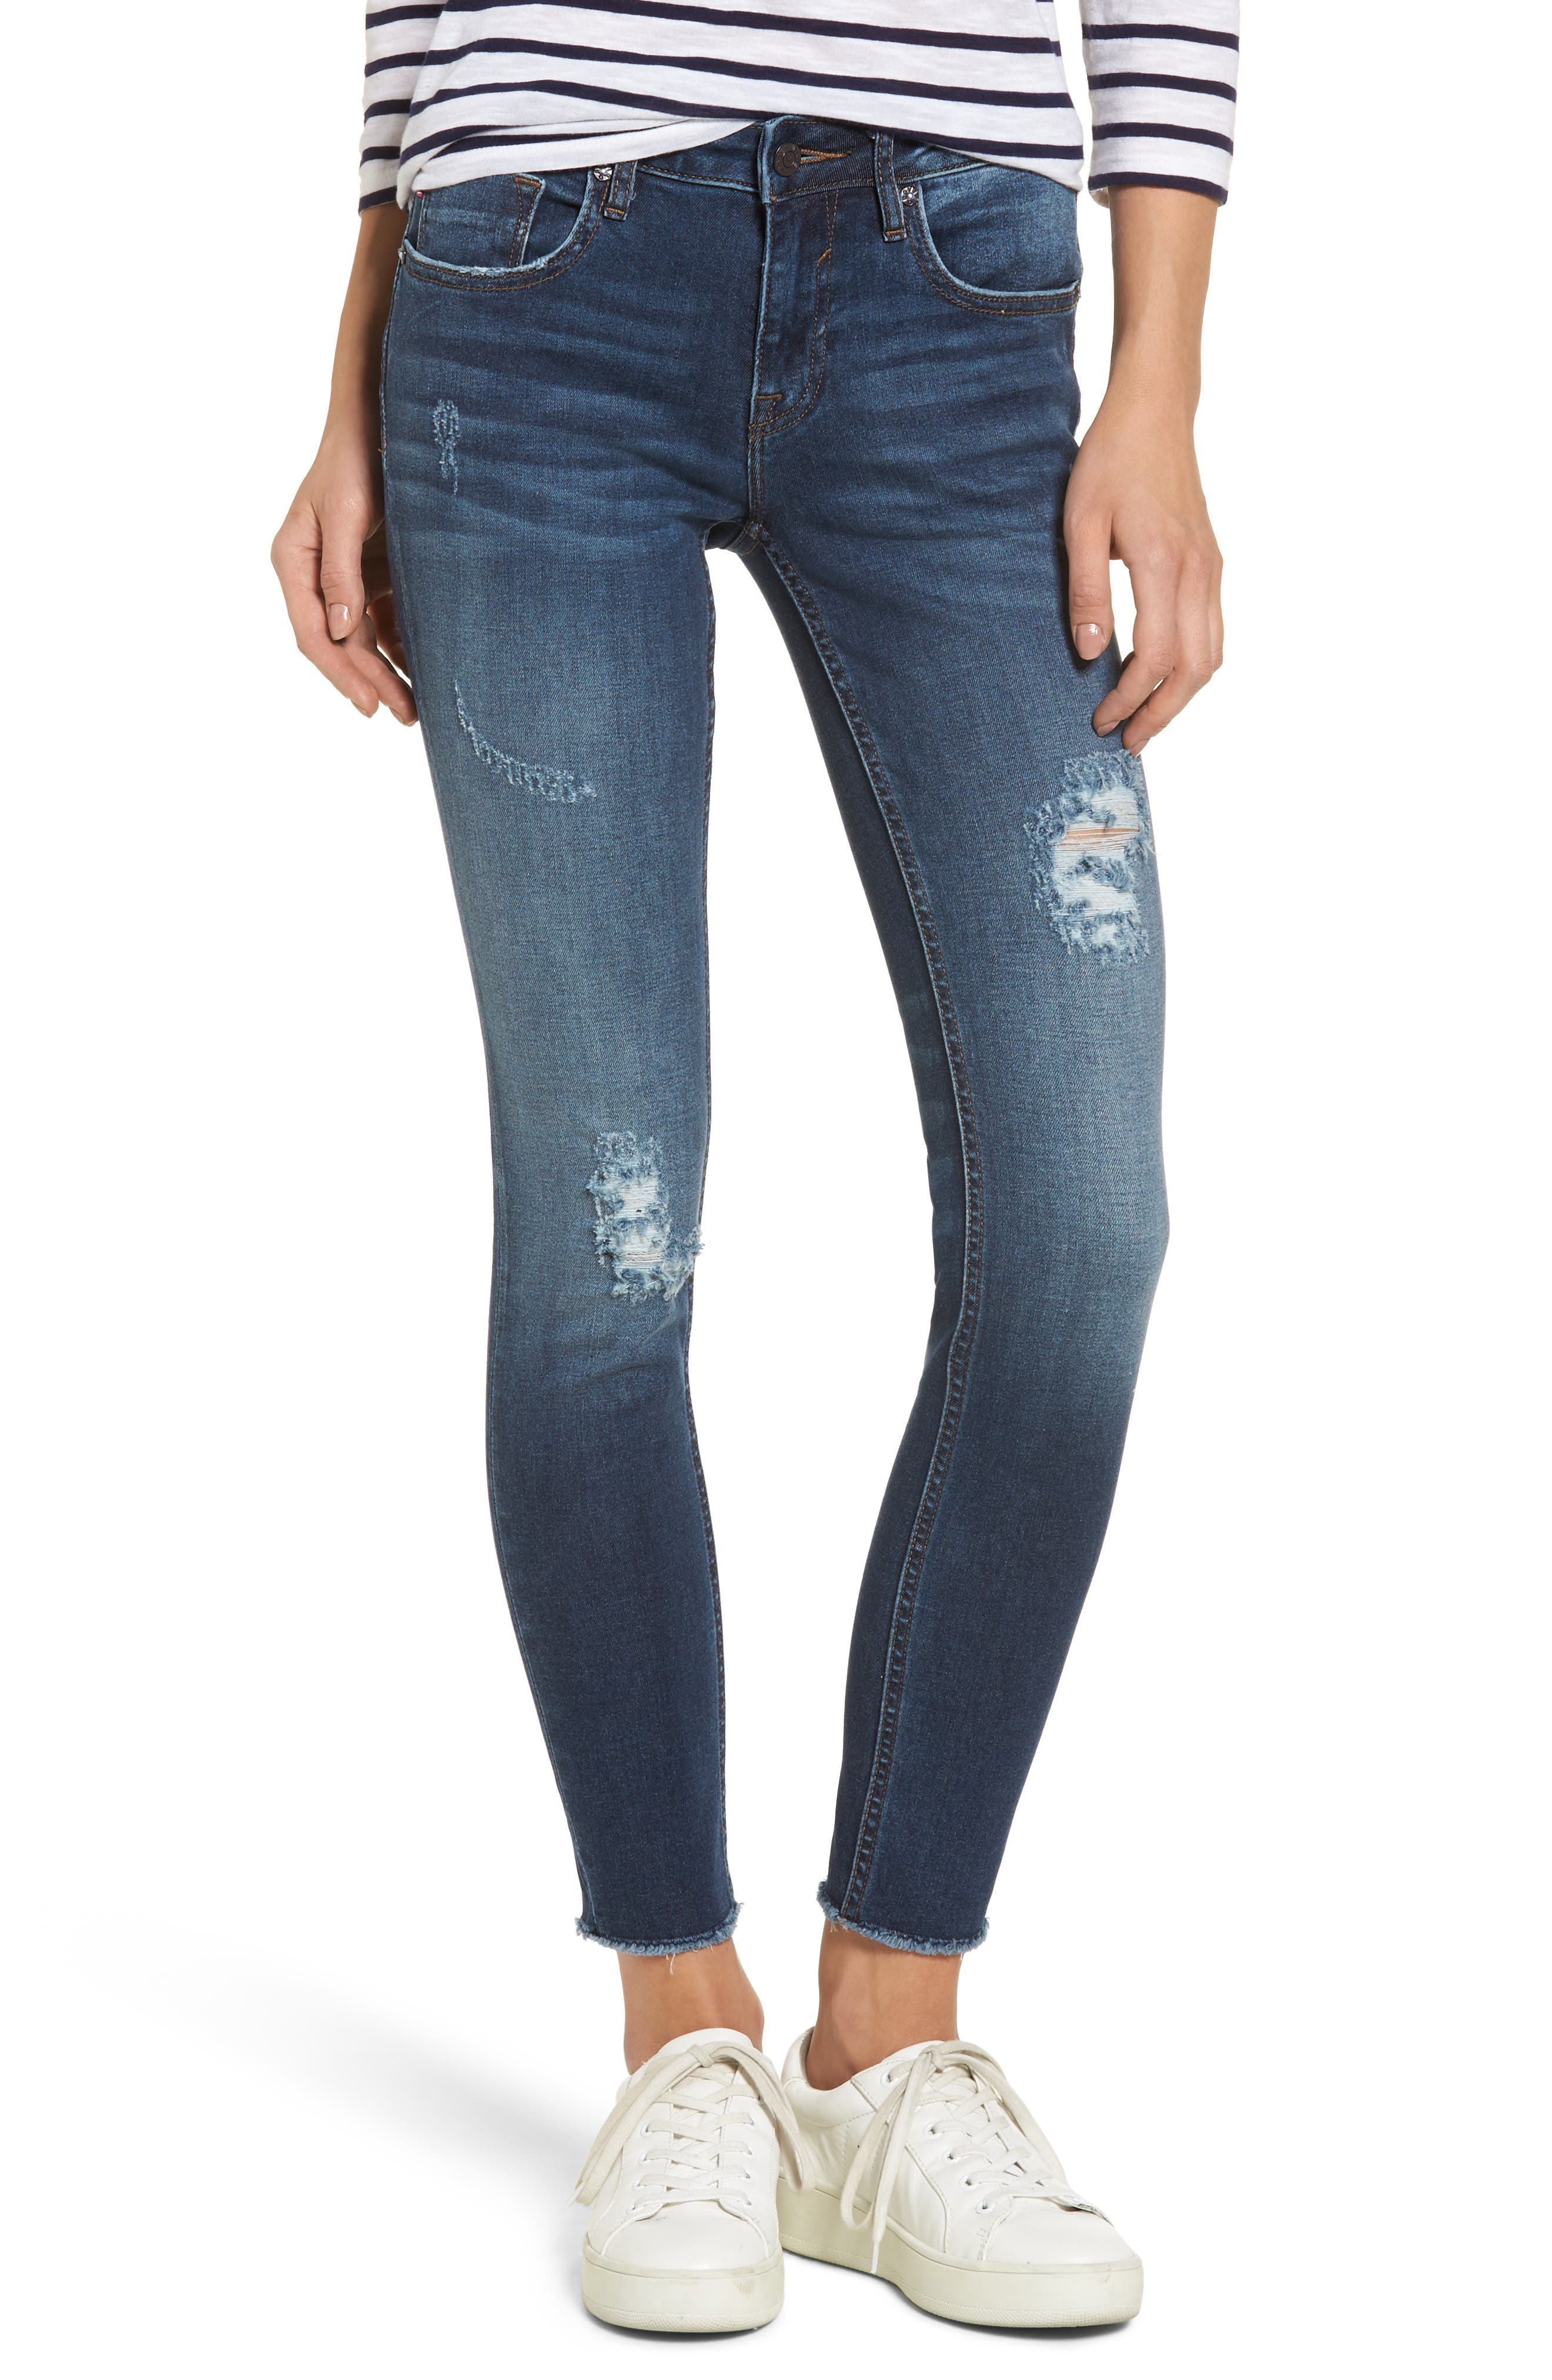 Jagger Distressed Skinny Jeans,                             Main thumbnail 1, color,                             Dark Wash